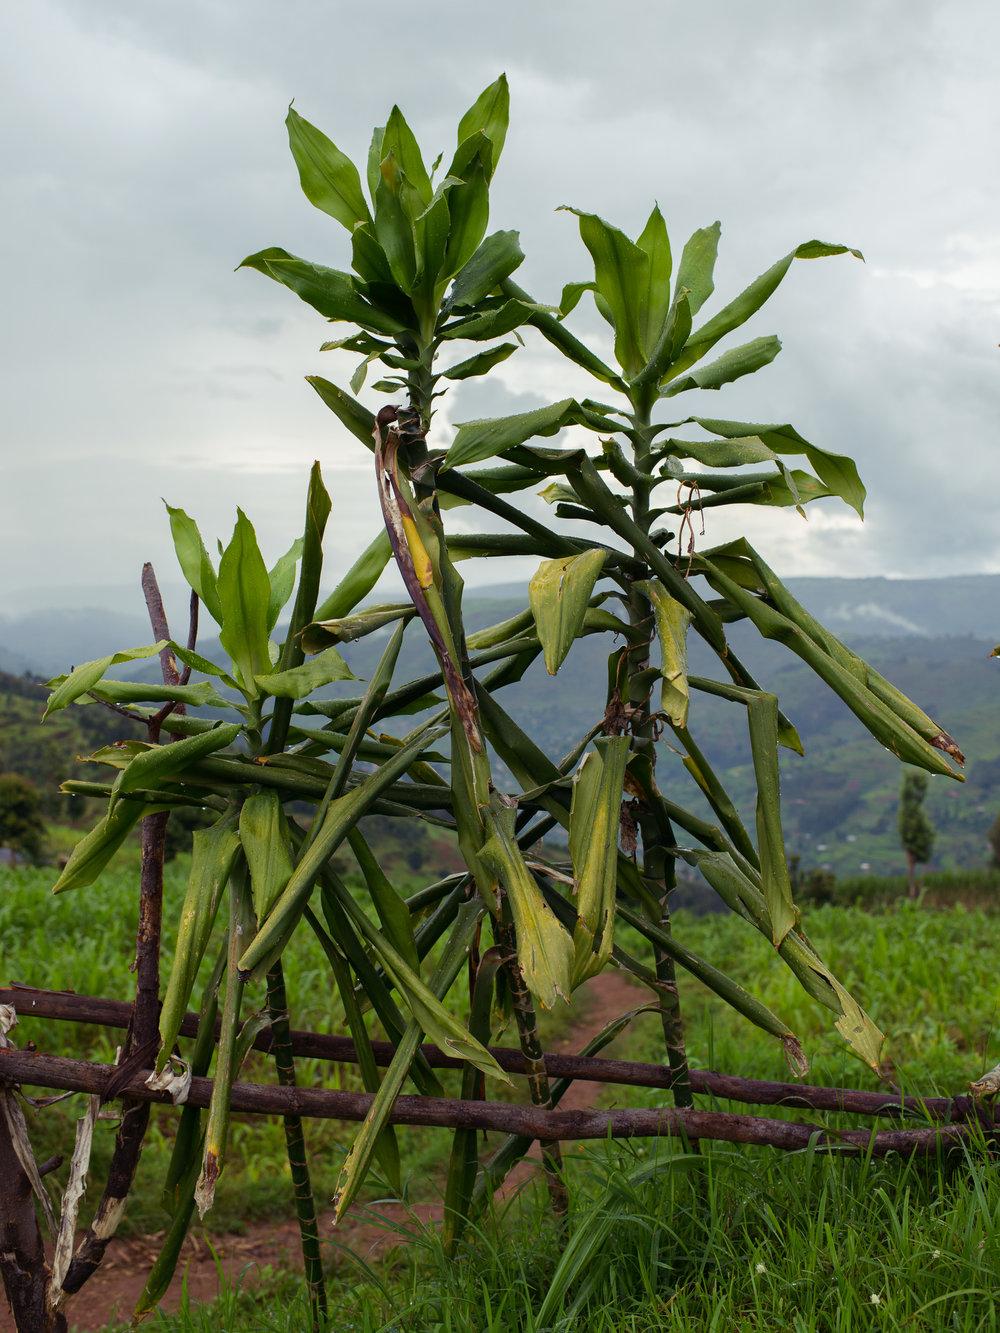 Fonerwa_Rwanda-4-24-14-0264-Edit.jpg